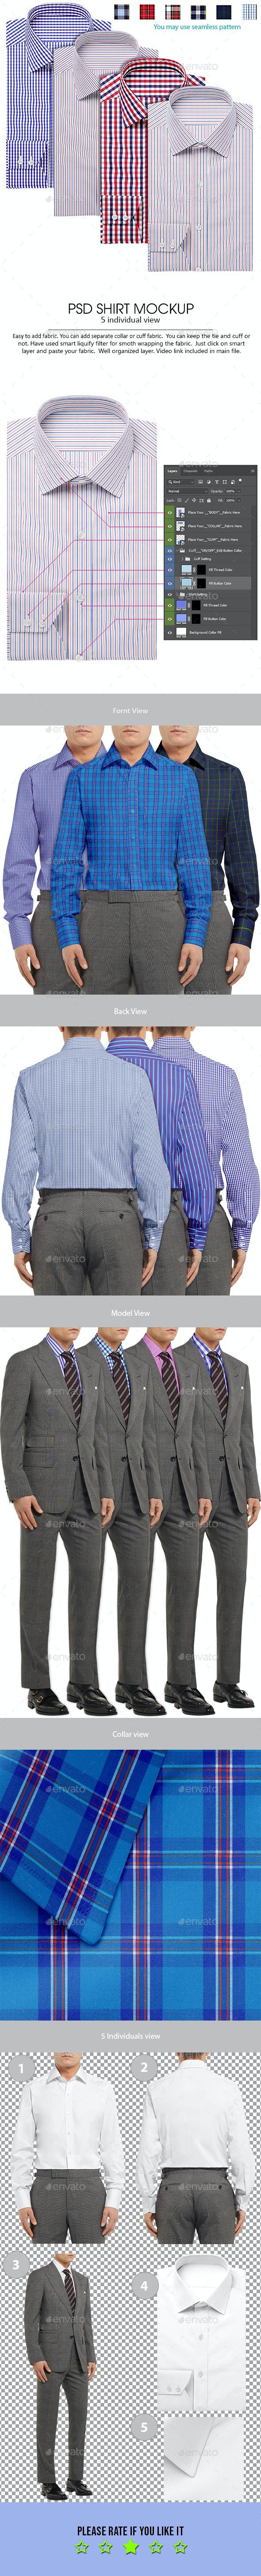 Shirt Mockup - Apparel Product Mock-Ups